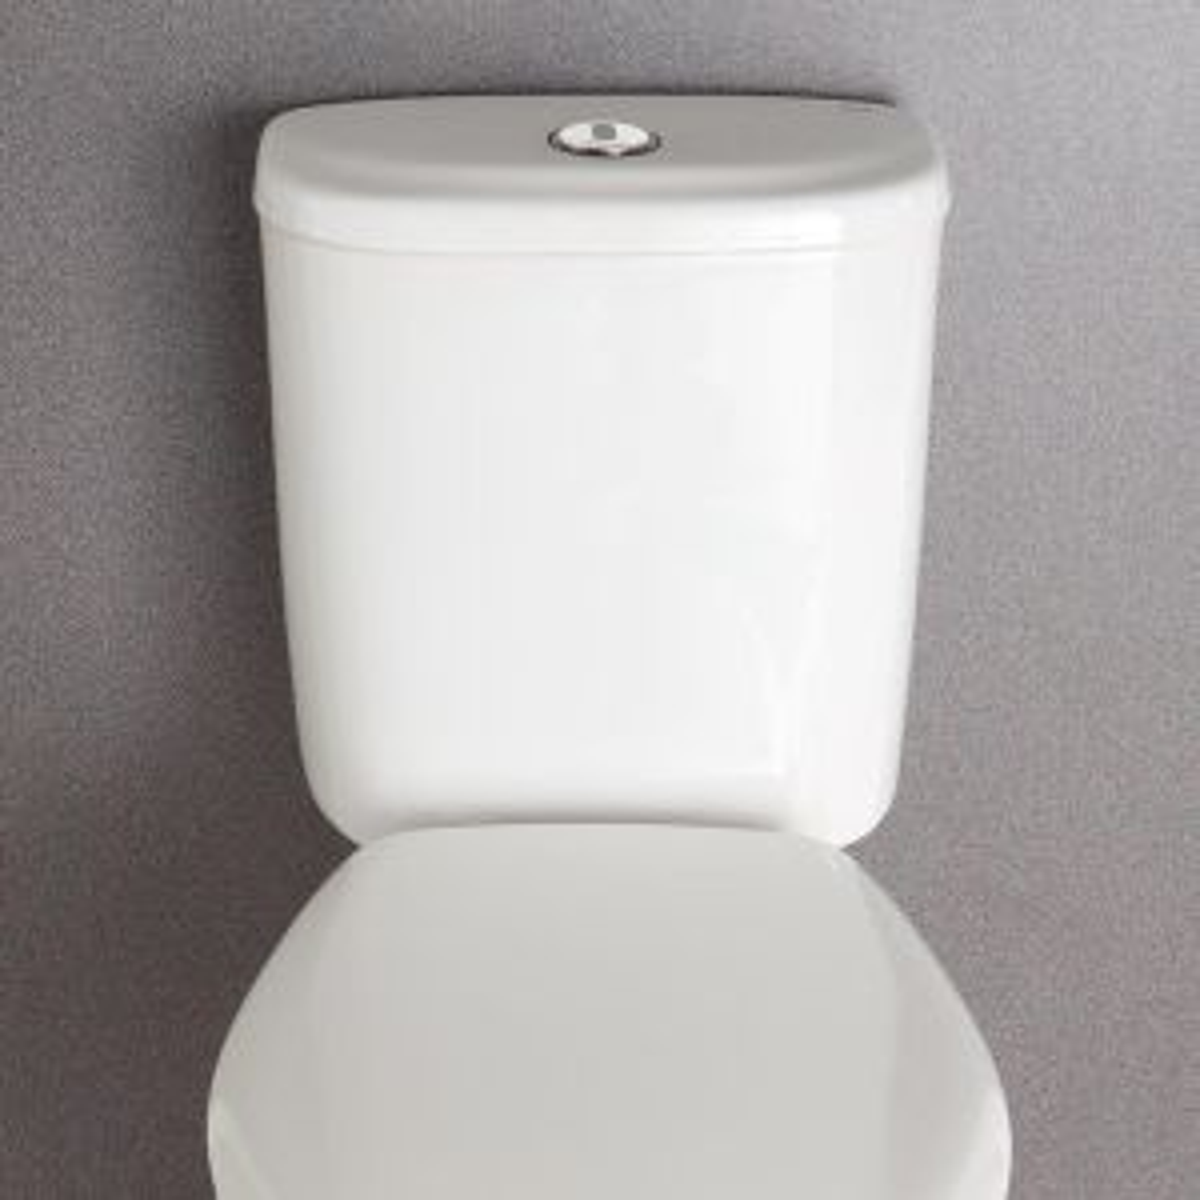 Cistermiser Easyflush Passive Walkaway No Touch WC Flush Valve - Lifestyle